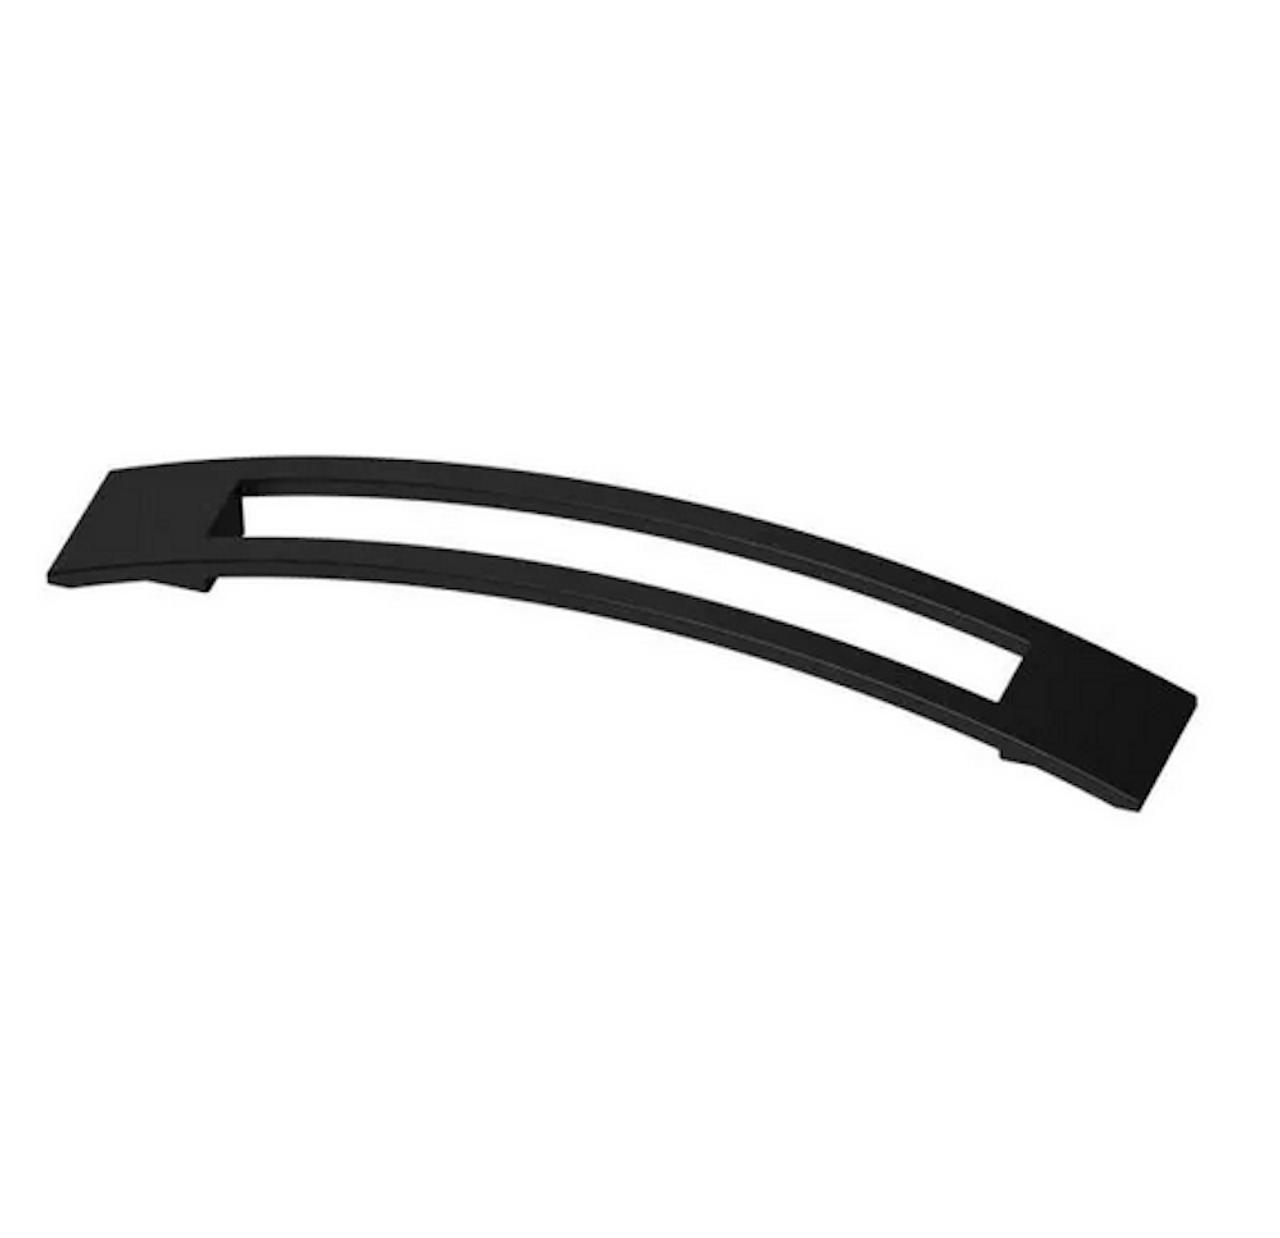 "Liberty P39234C-FB 6 5/16"" Cutout Slight Curved Cabinet Pull Flat Black"